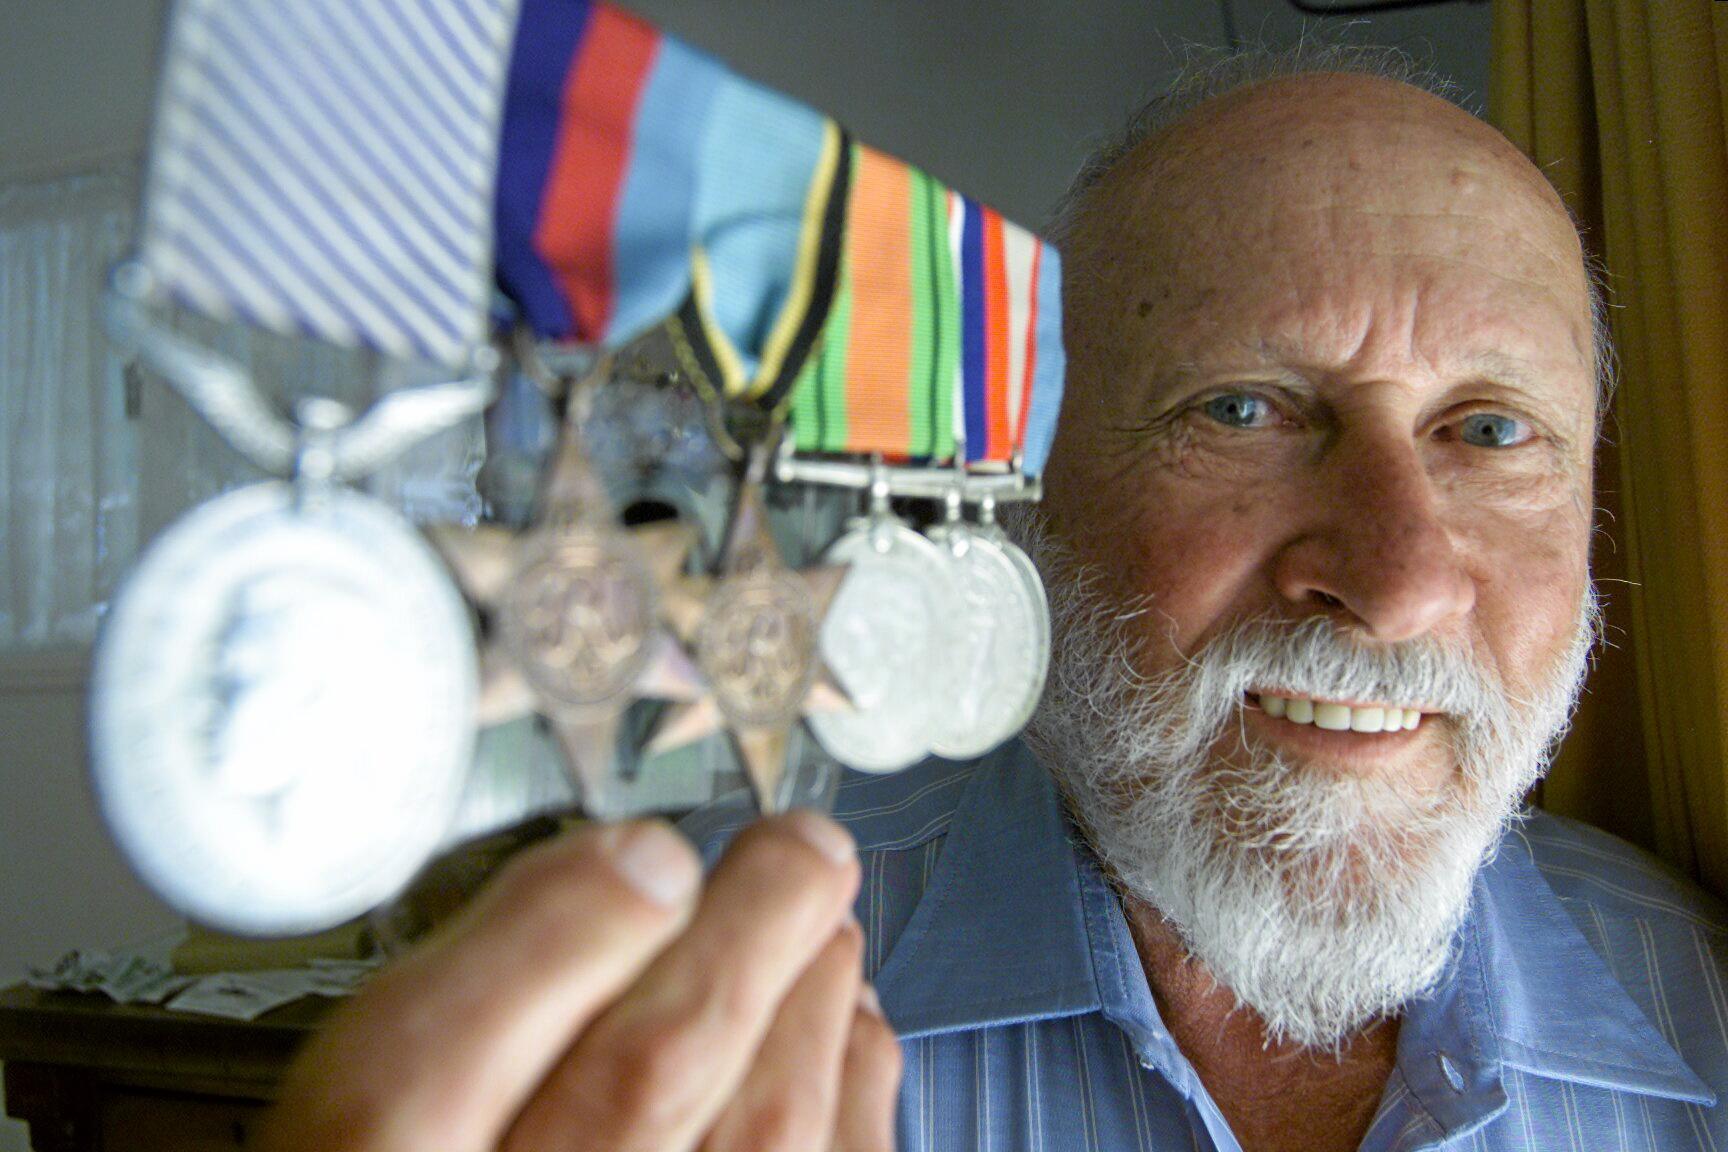 108447 24/04/02 Yandina WW2 veteran Dusty Miller of Yandina with some of his